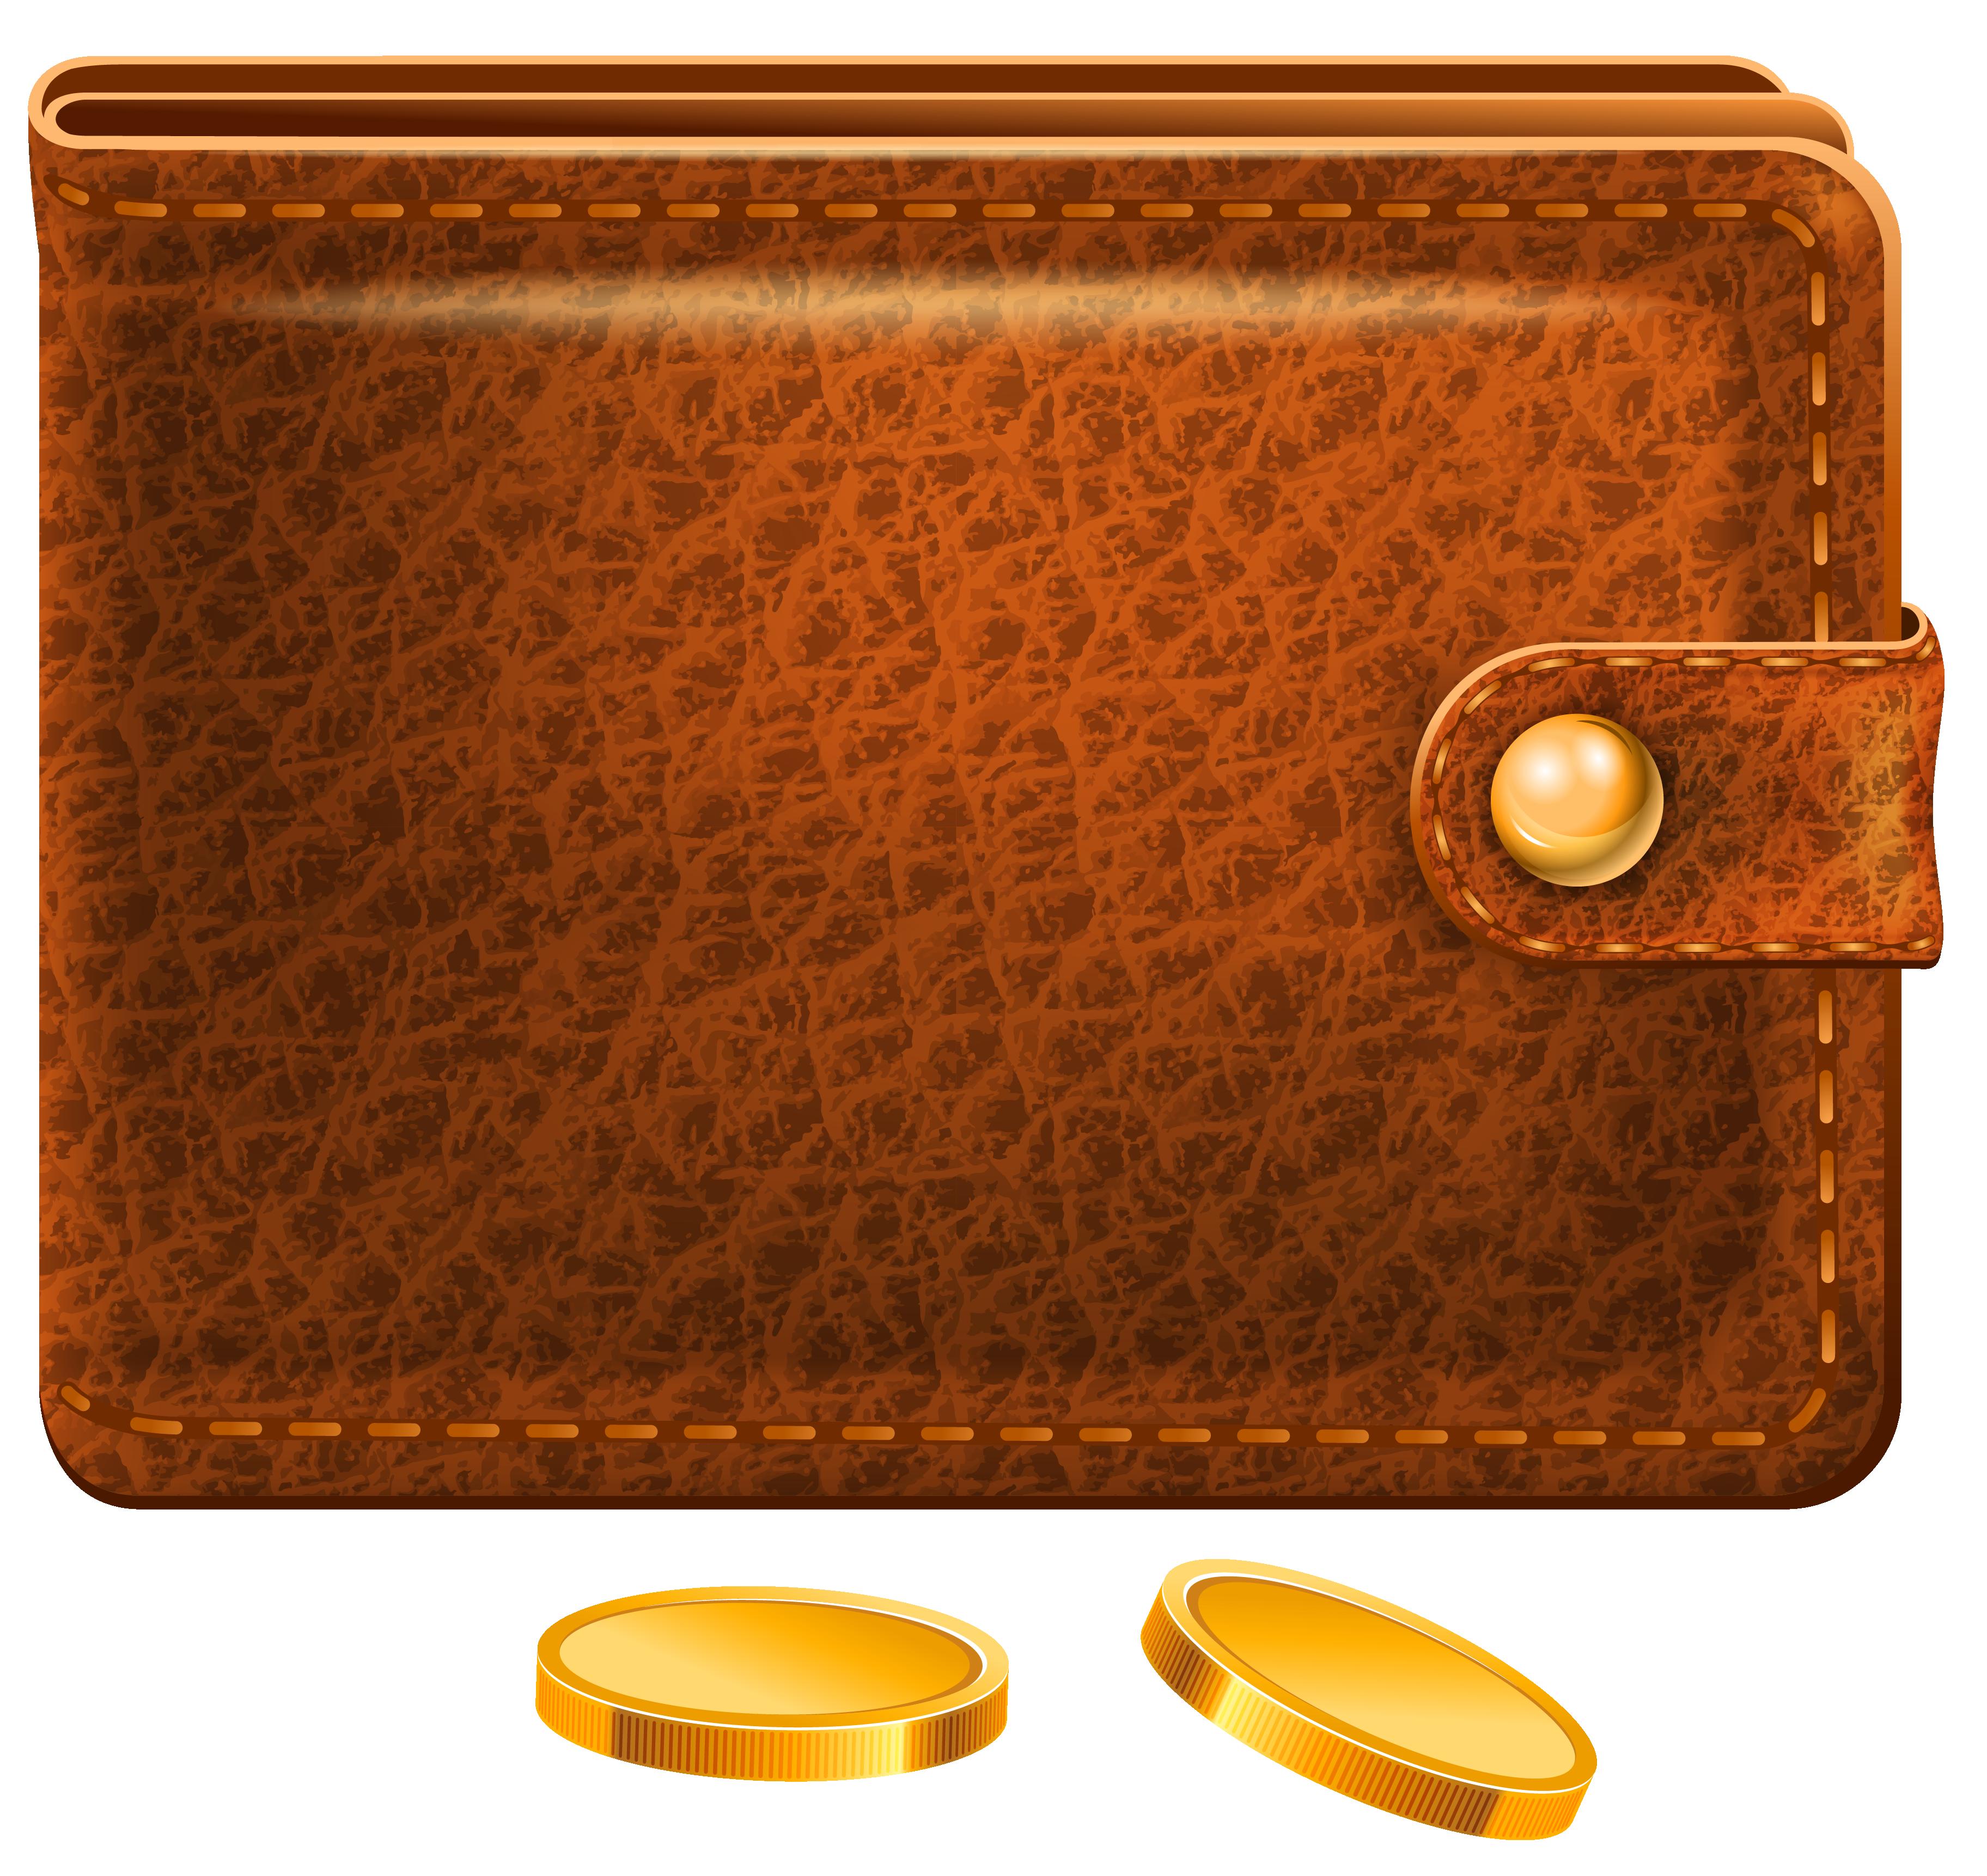 Wallet PNG - 2287